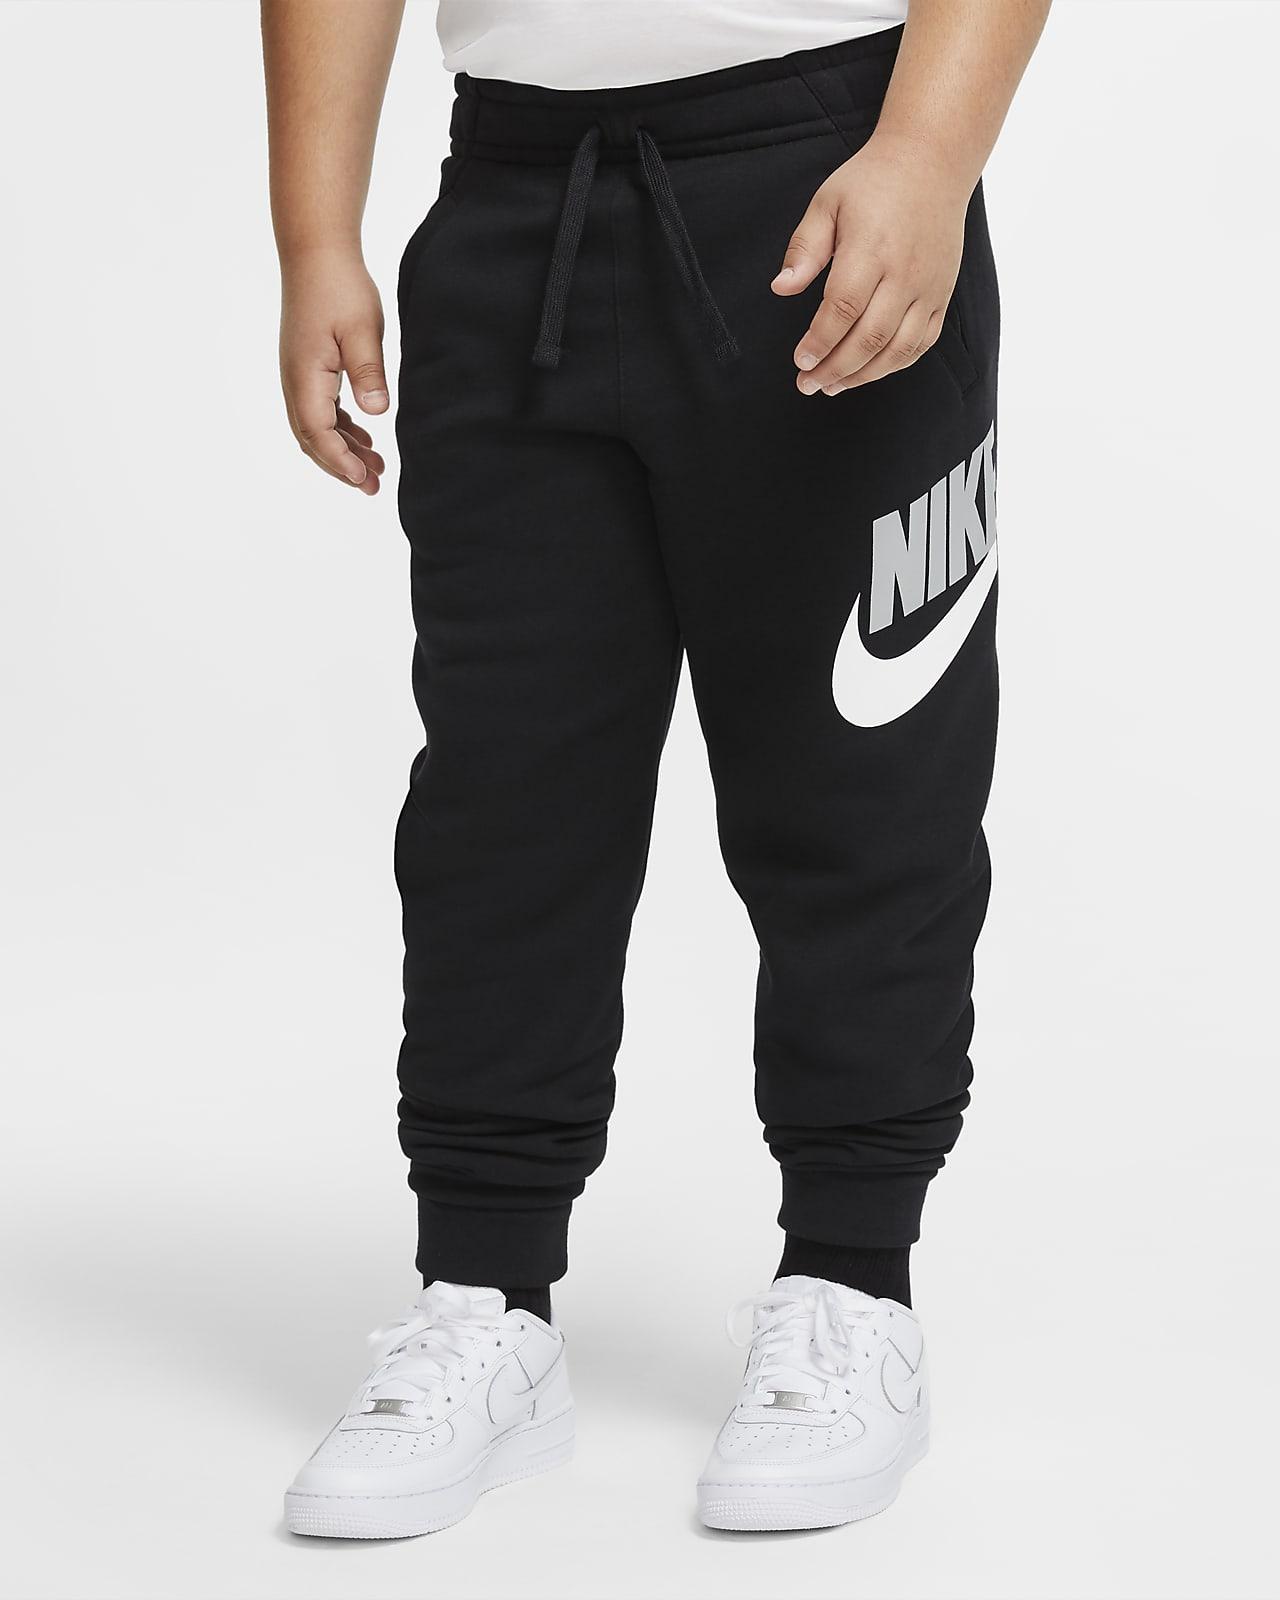 Calças Nike Sportswear Club Fleece Júnior (rapaz) (tamanhos grandes)